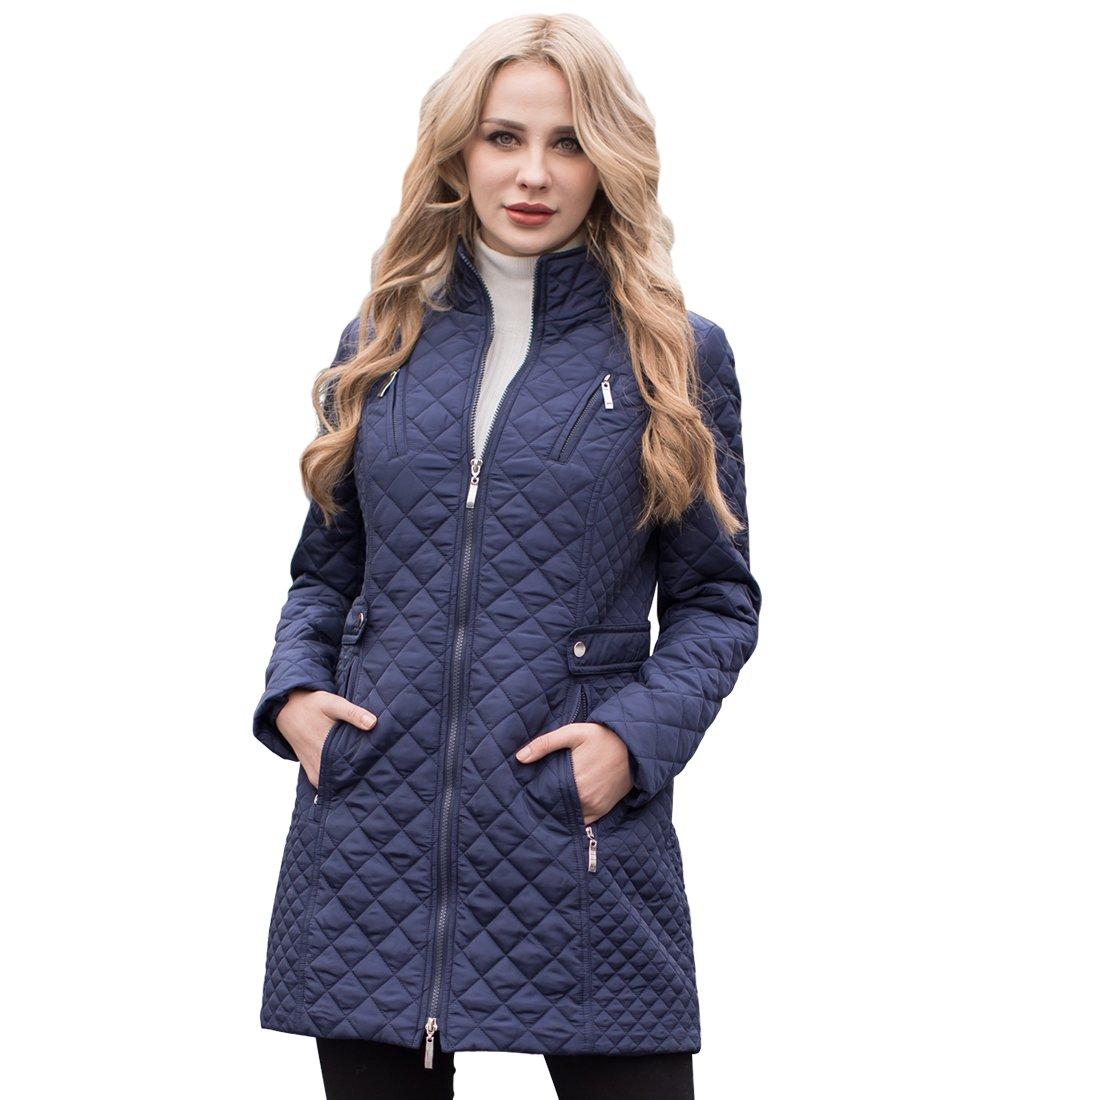 MS·VASSA Ladies Long Jacket Outerwear Winter Coat Padded Warm Zippers Pockets